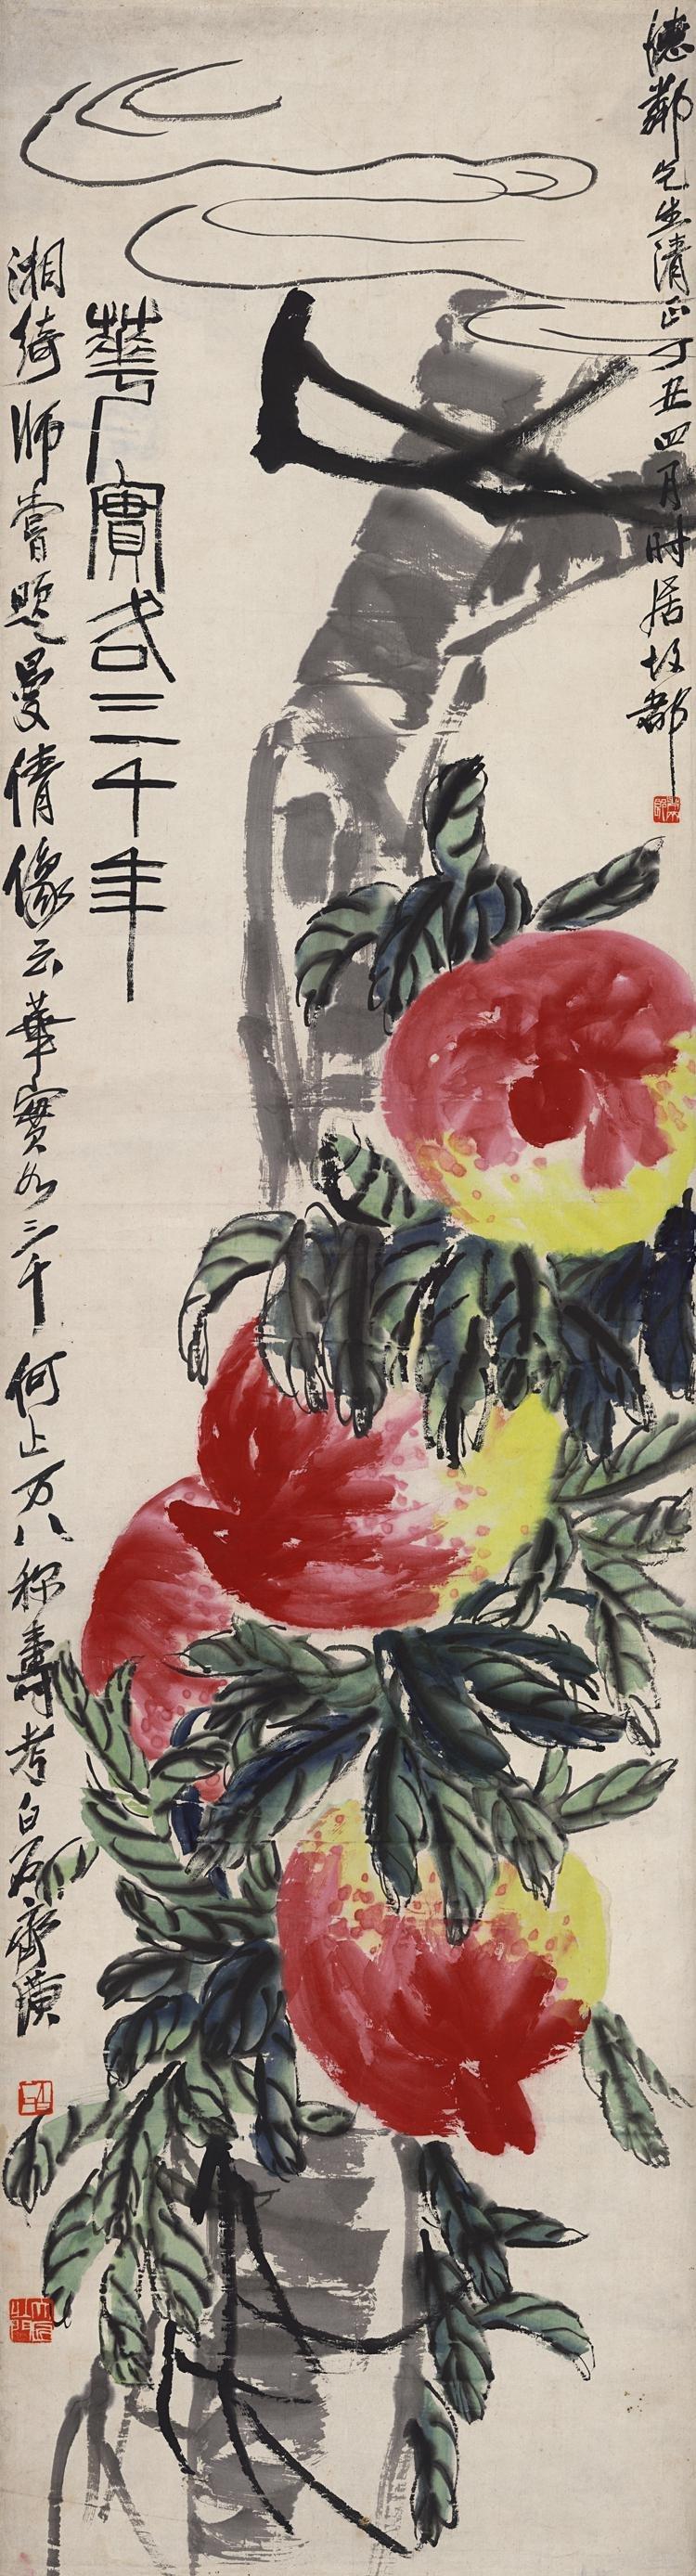 Chinese painting by Qi Bai Shi